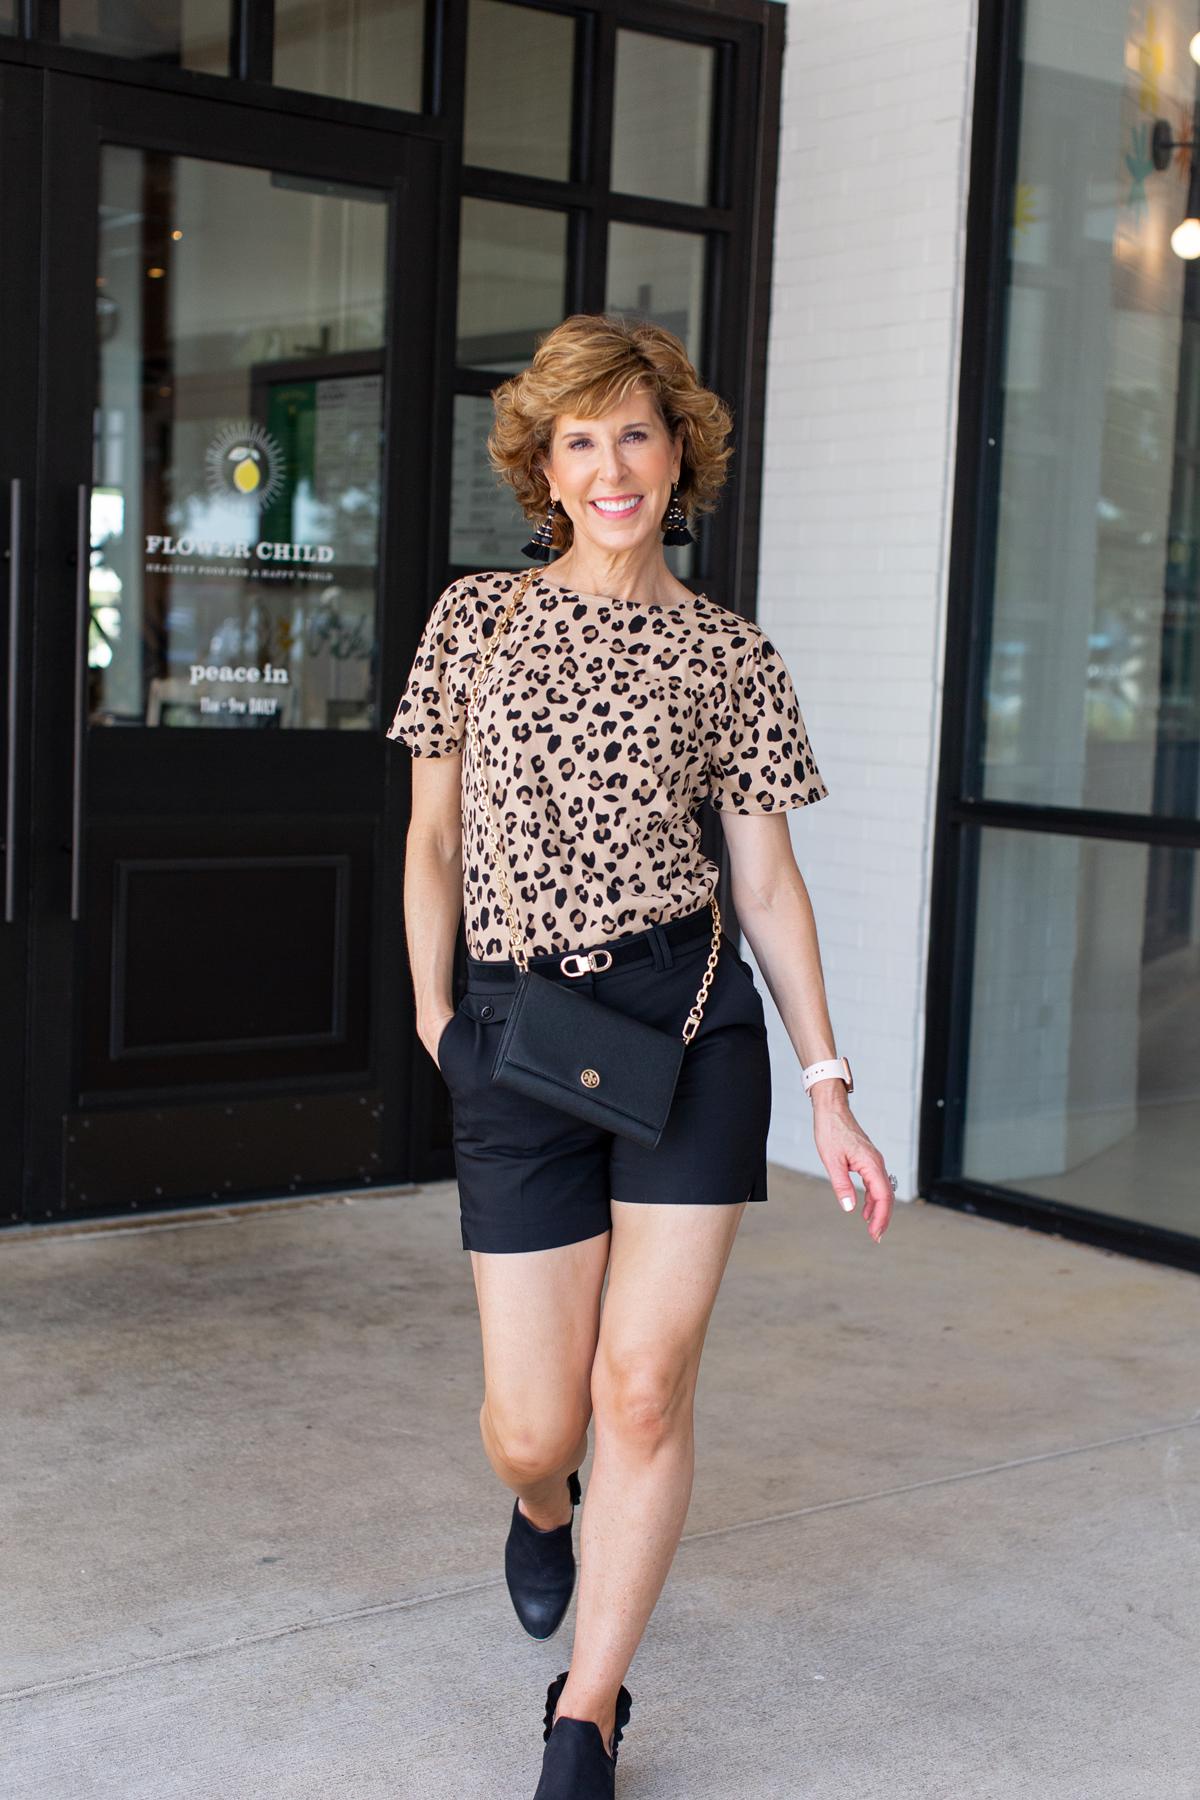 woman in leopard print top and black shorts walking toward camera